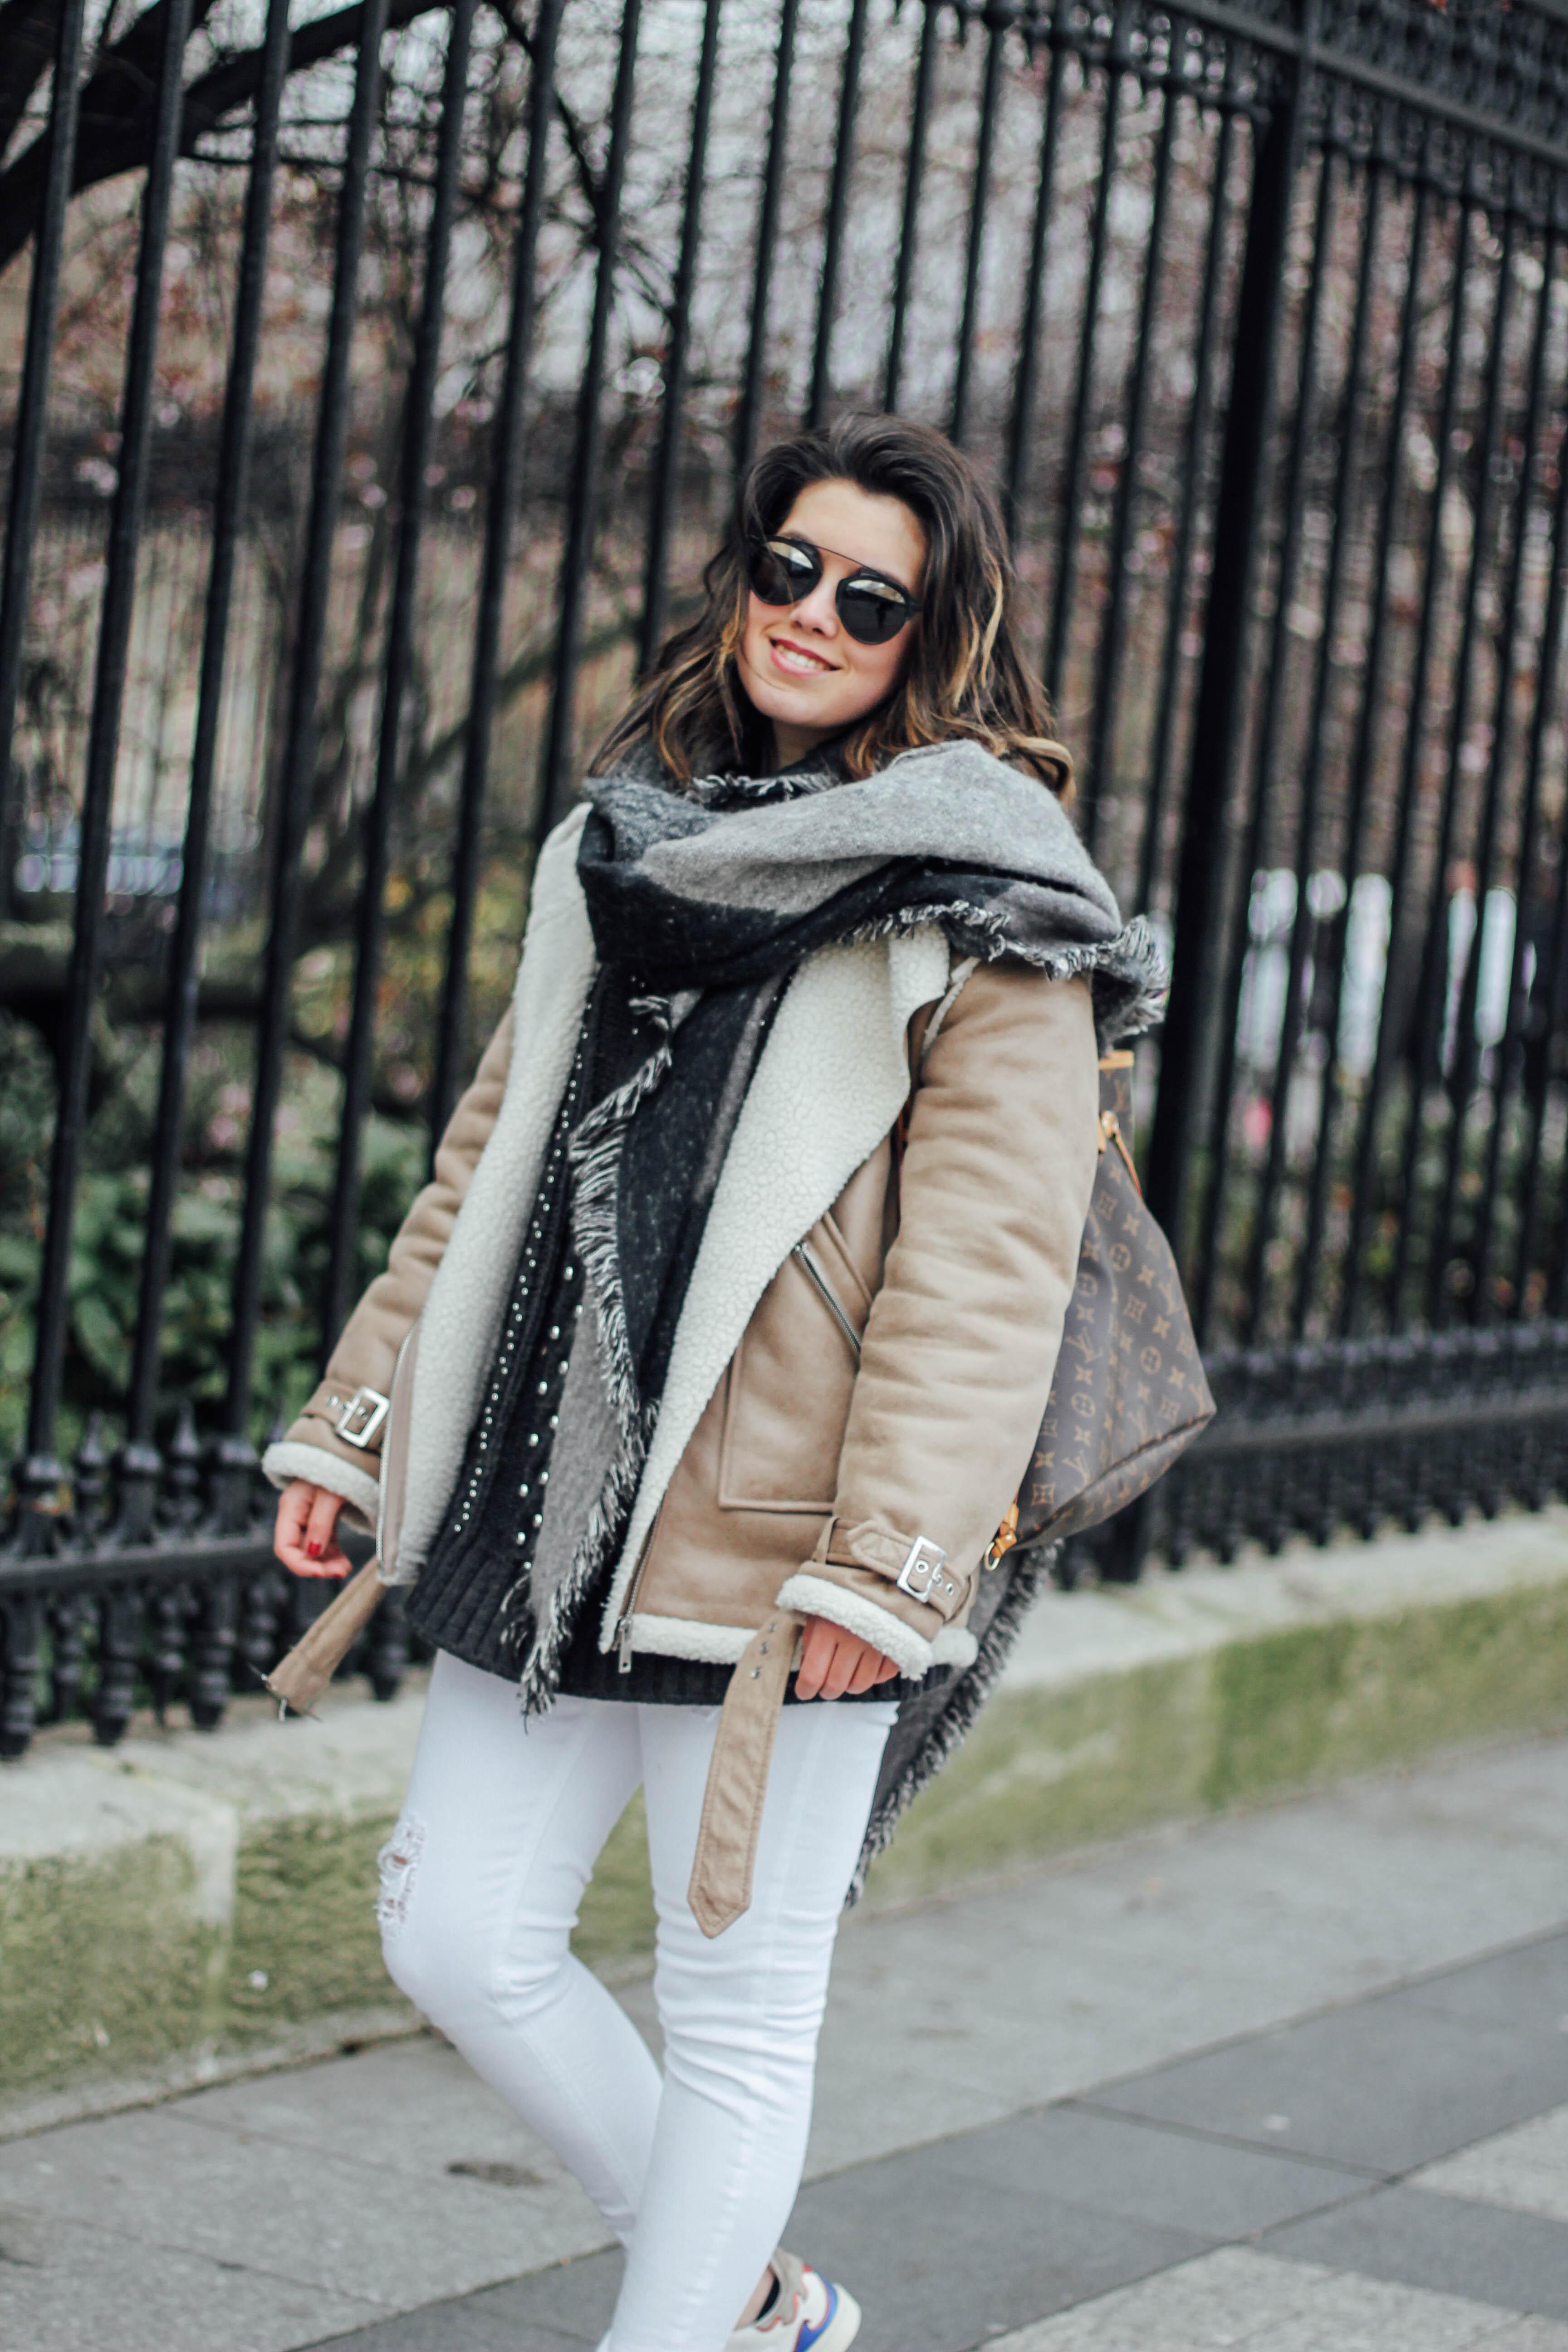 shearling-jacket-beige-isabel-marant-sneakers-streetstyle big scarf myblueberrynightsblog